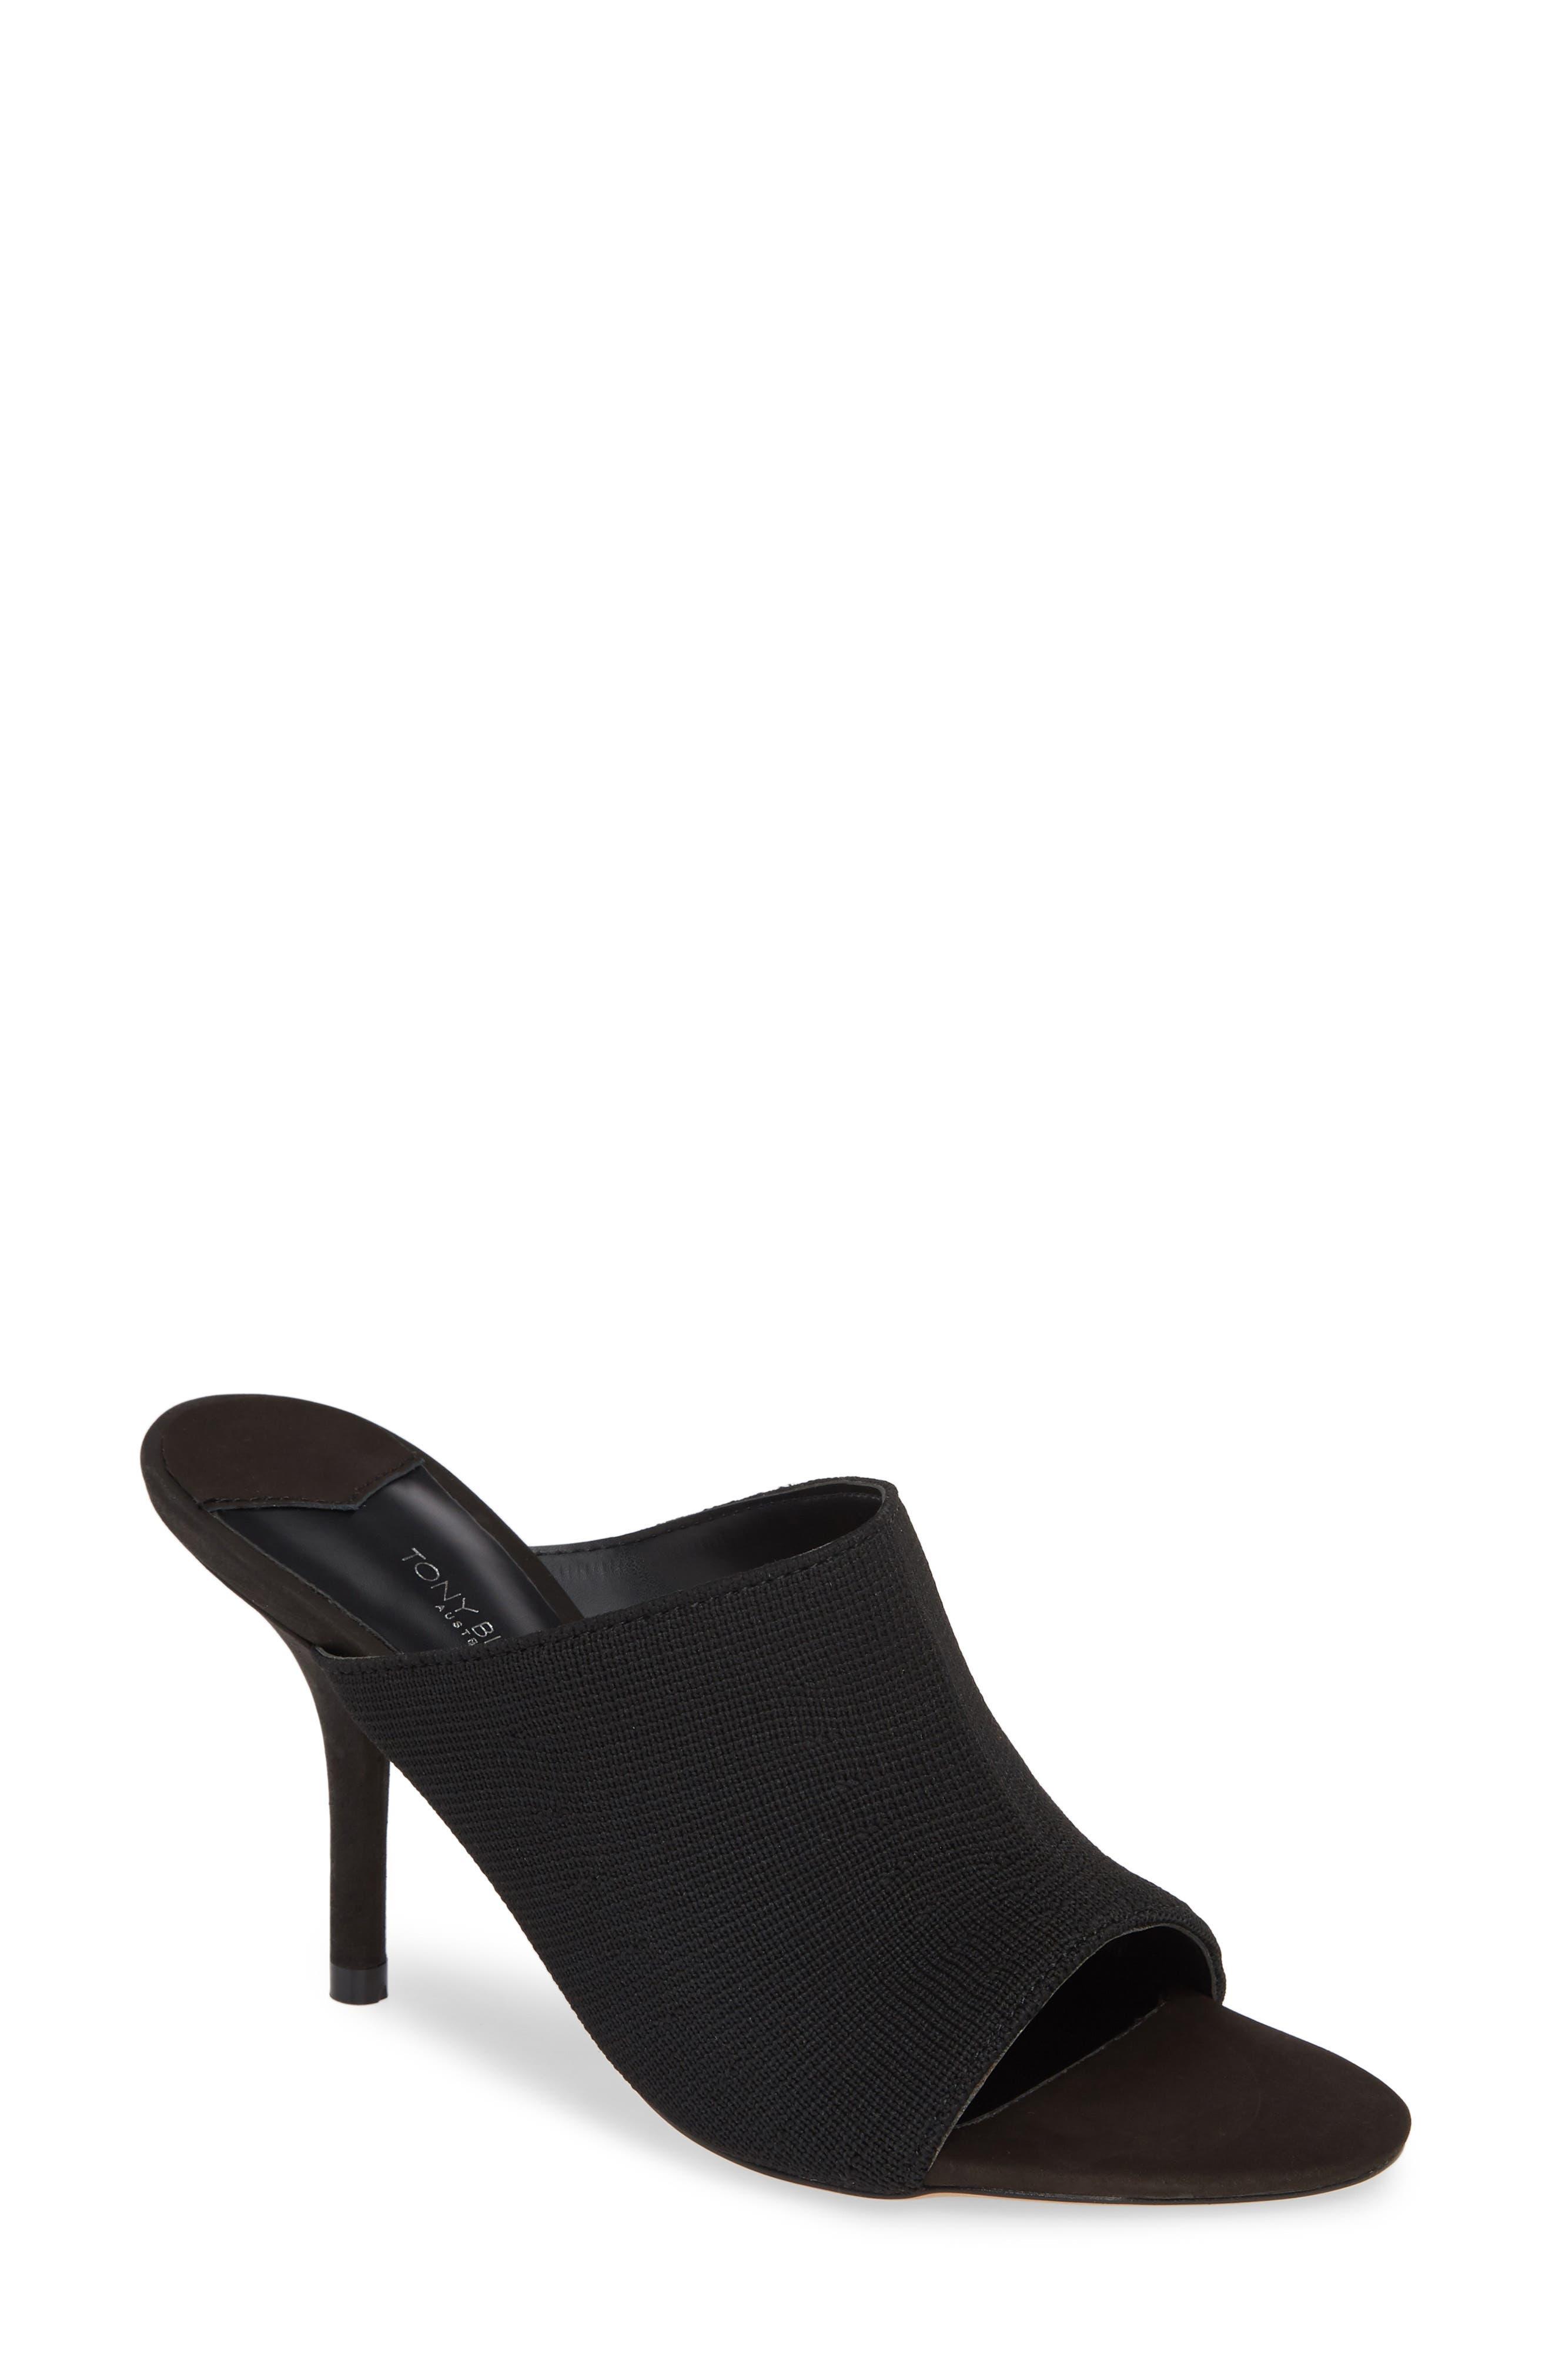 Inca Slide Sandal,                             Main thumbnail 1, color,                             BLACK BORDEAUX FABRIC